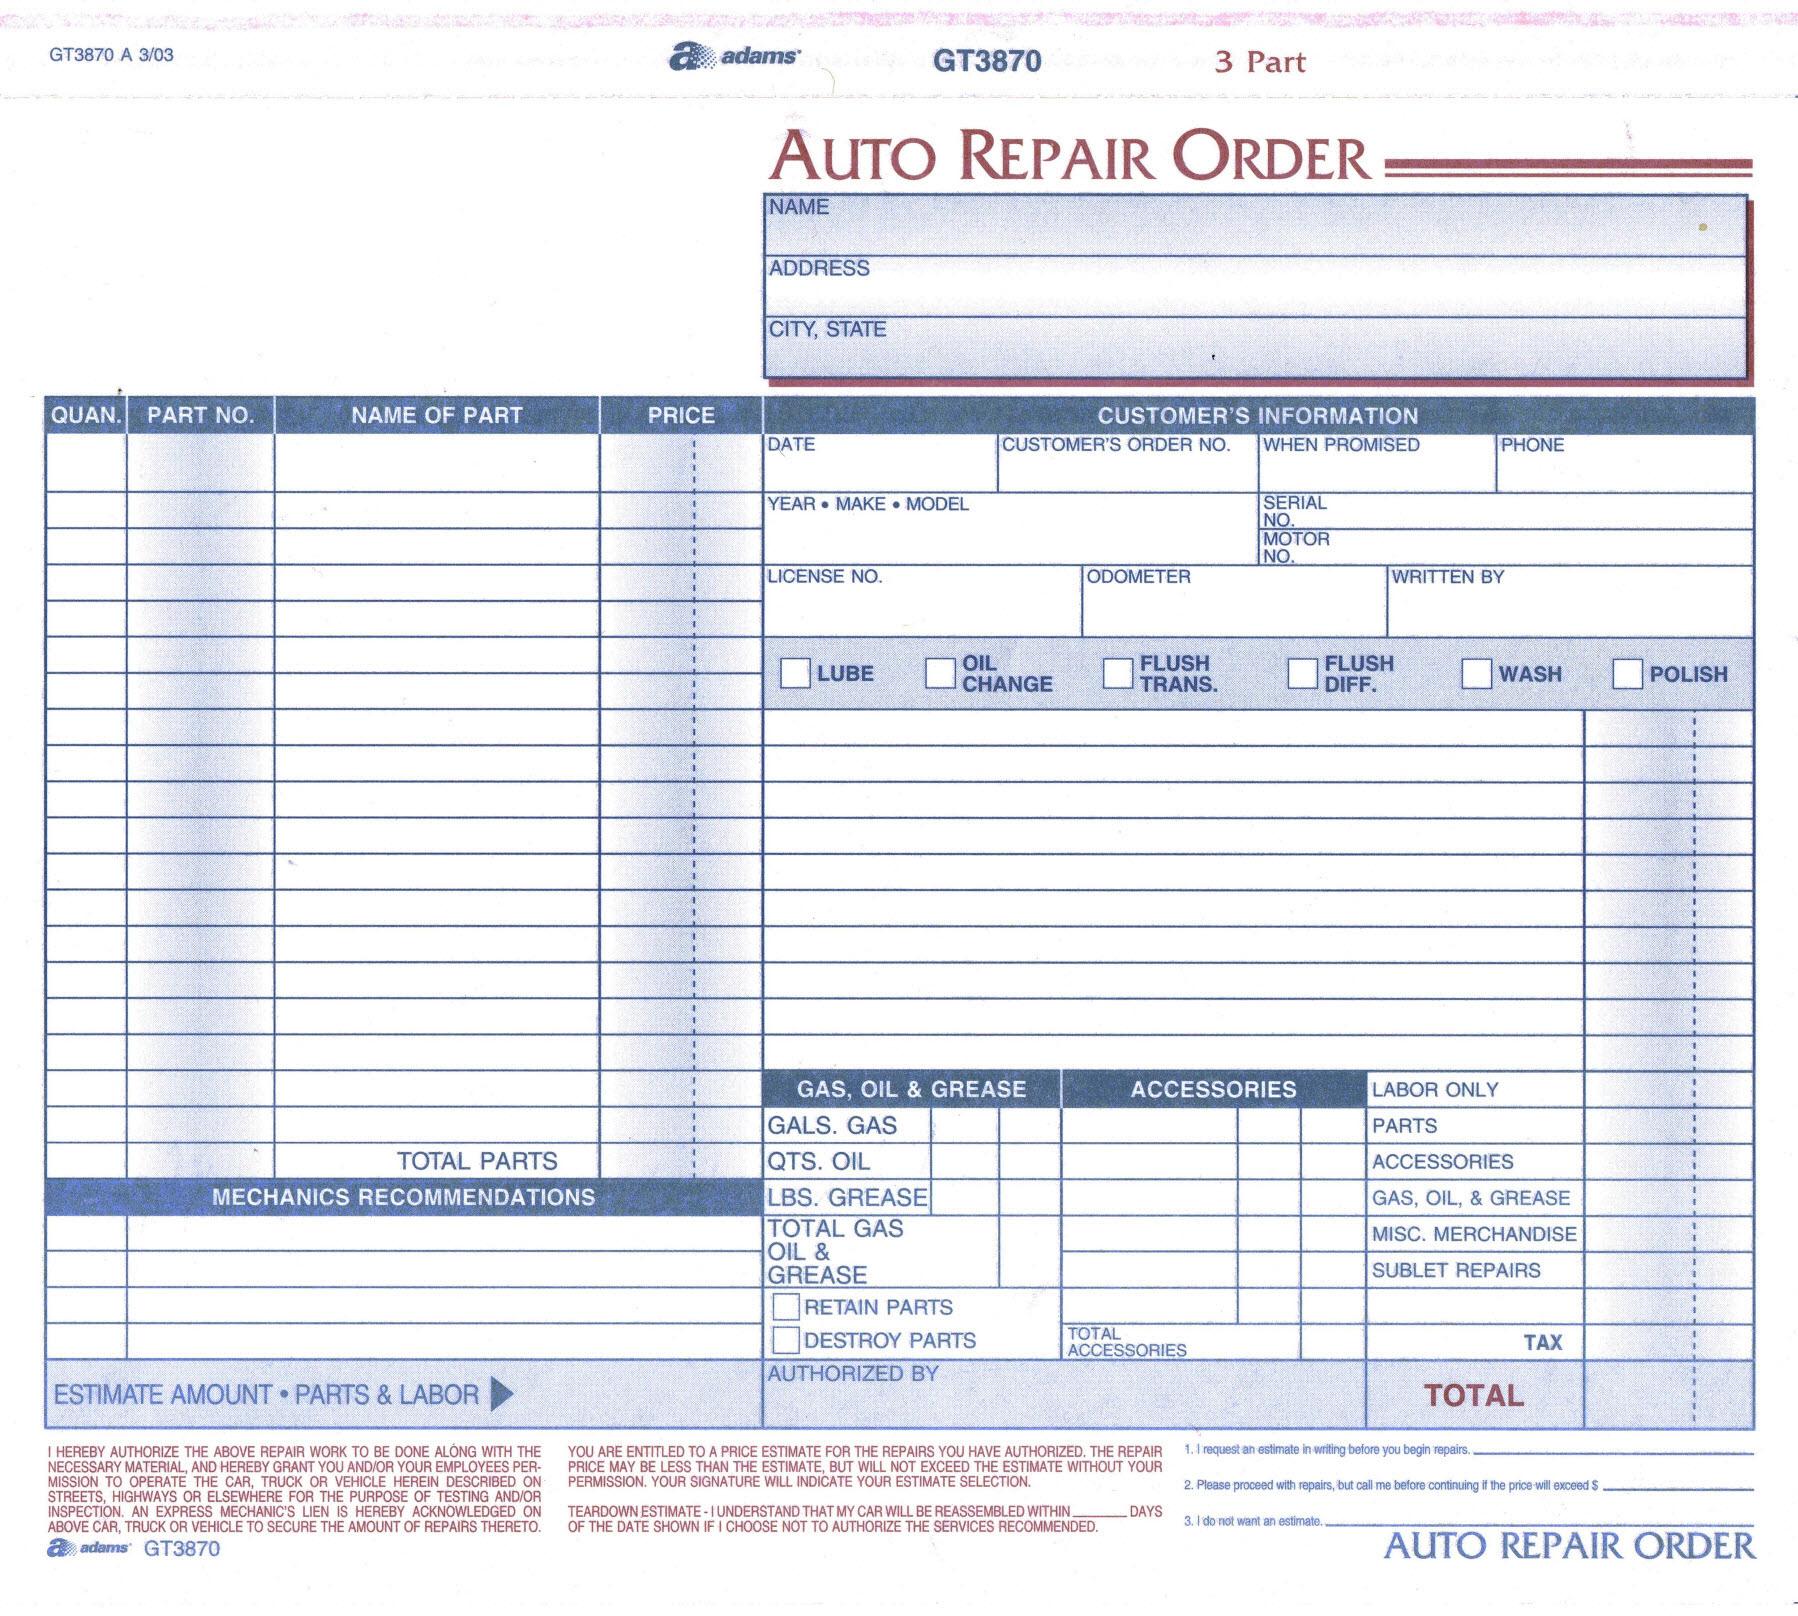 Adams Gift Certificate Template